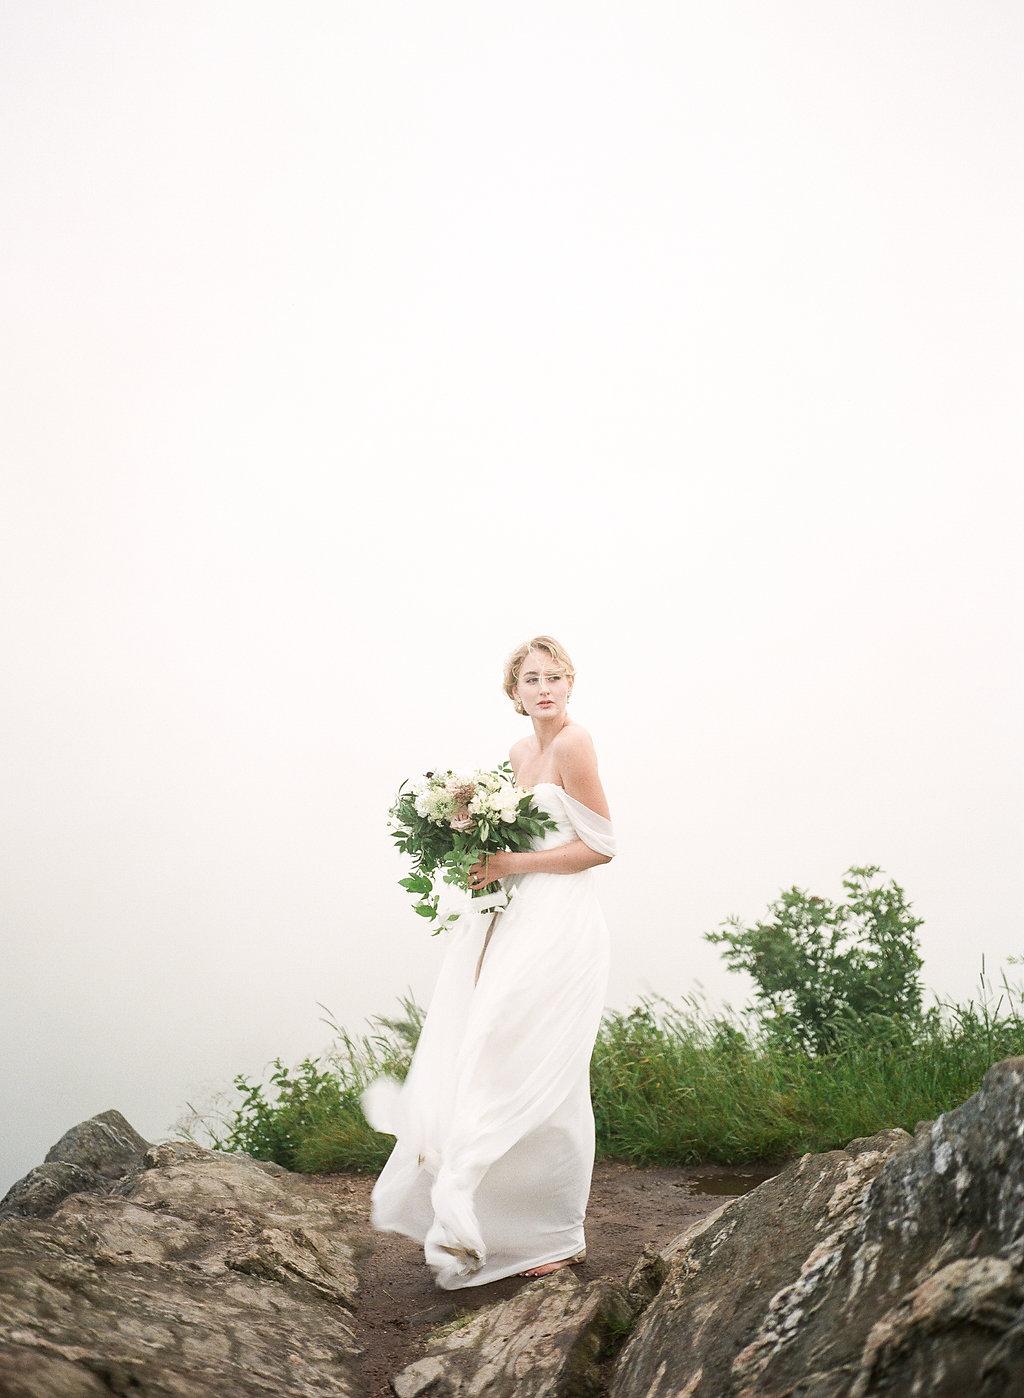 josie-photographs-urban-petals-mountain-wedding-north-carolina-mountain-wedding-ivory-and-beau-bridal-boutique-savannah-wedding-dresses-savannah-bridal-boutique-savannah-wedding-gowns-sarah-seven-lafayette-sarah-seven-wedding-dress-boho-bride-13.jpg